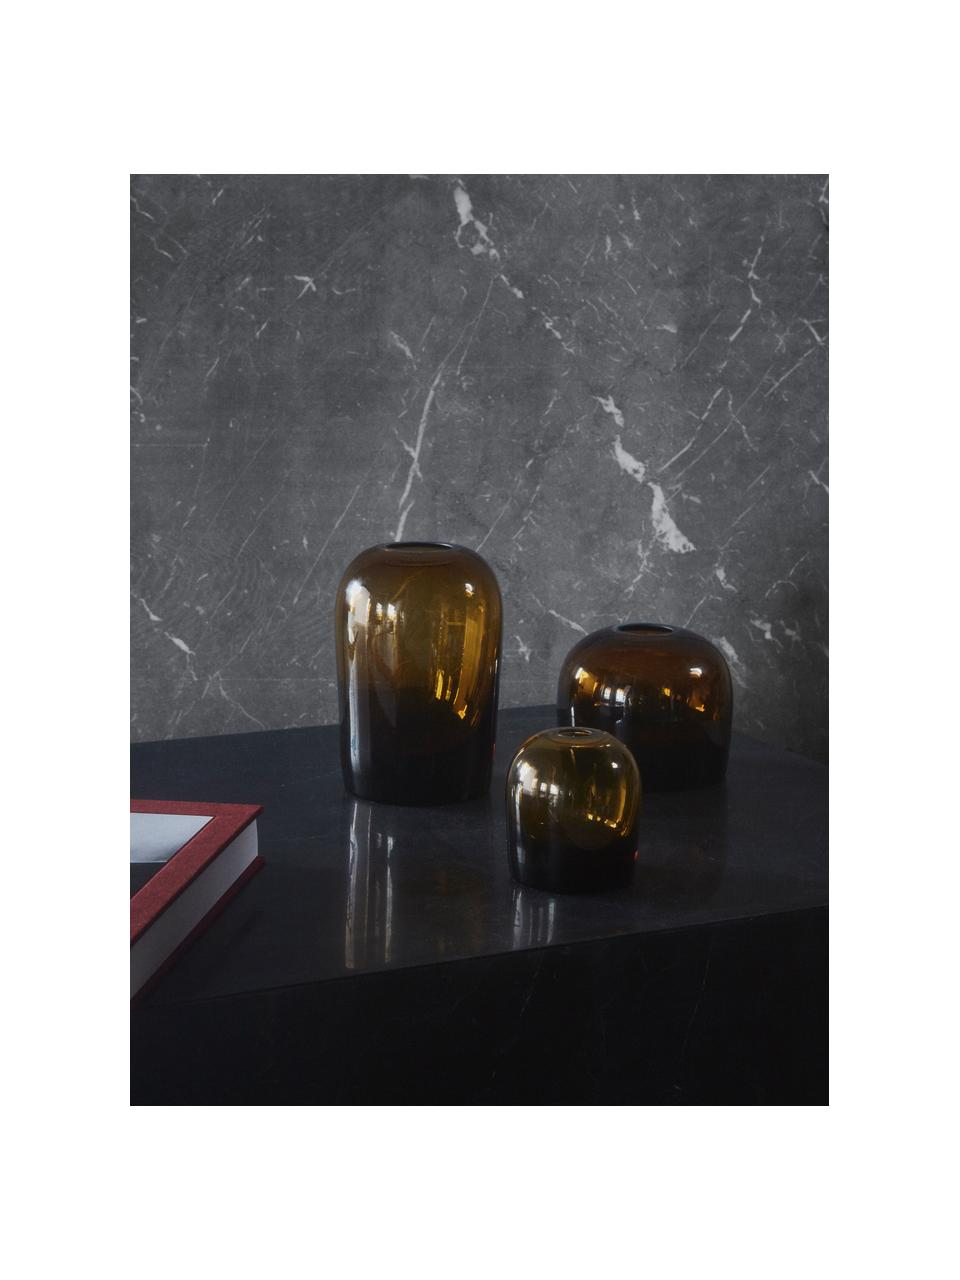 Vaso elegante in vetro soffiato Troll, Vetro soffiato, Ambra, Ø 13 x Alt. 19 cm